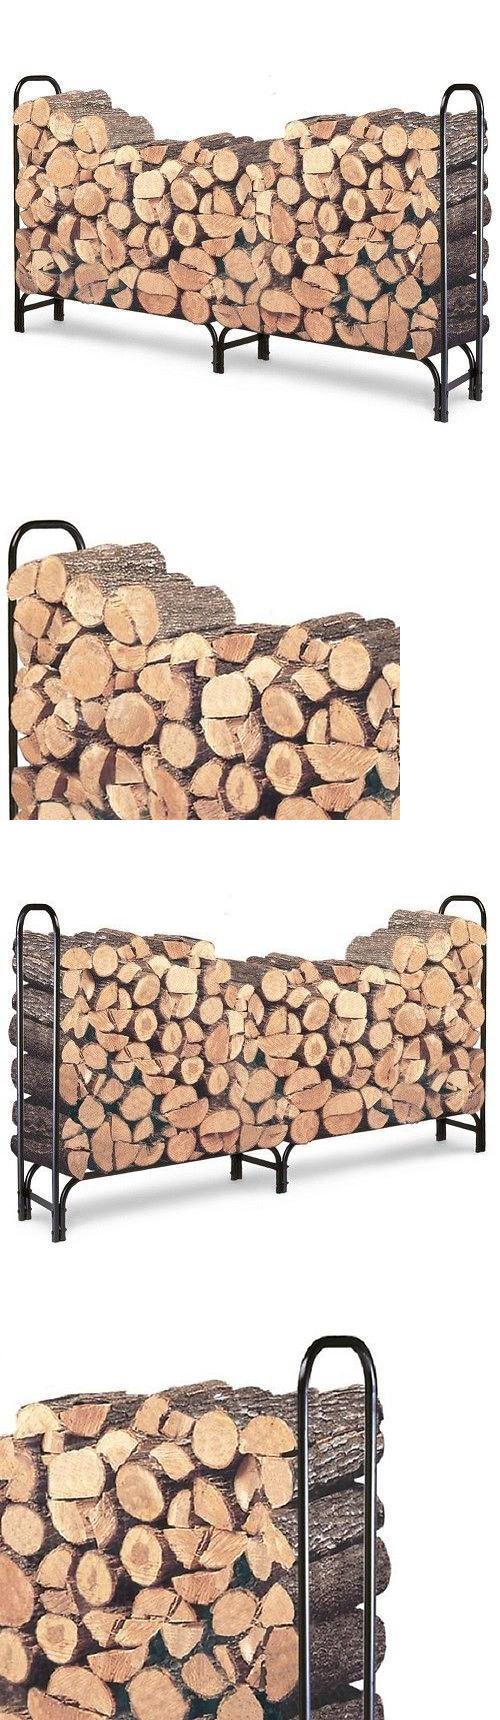 ebay firewood rack